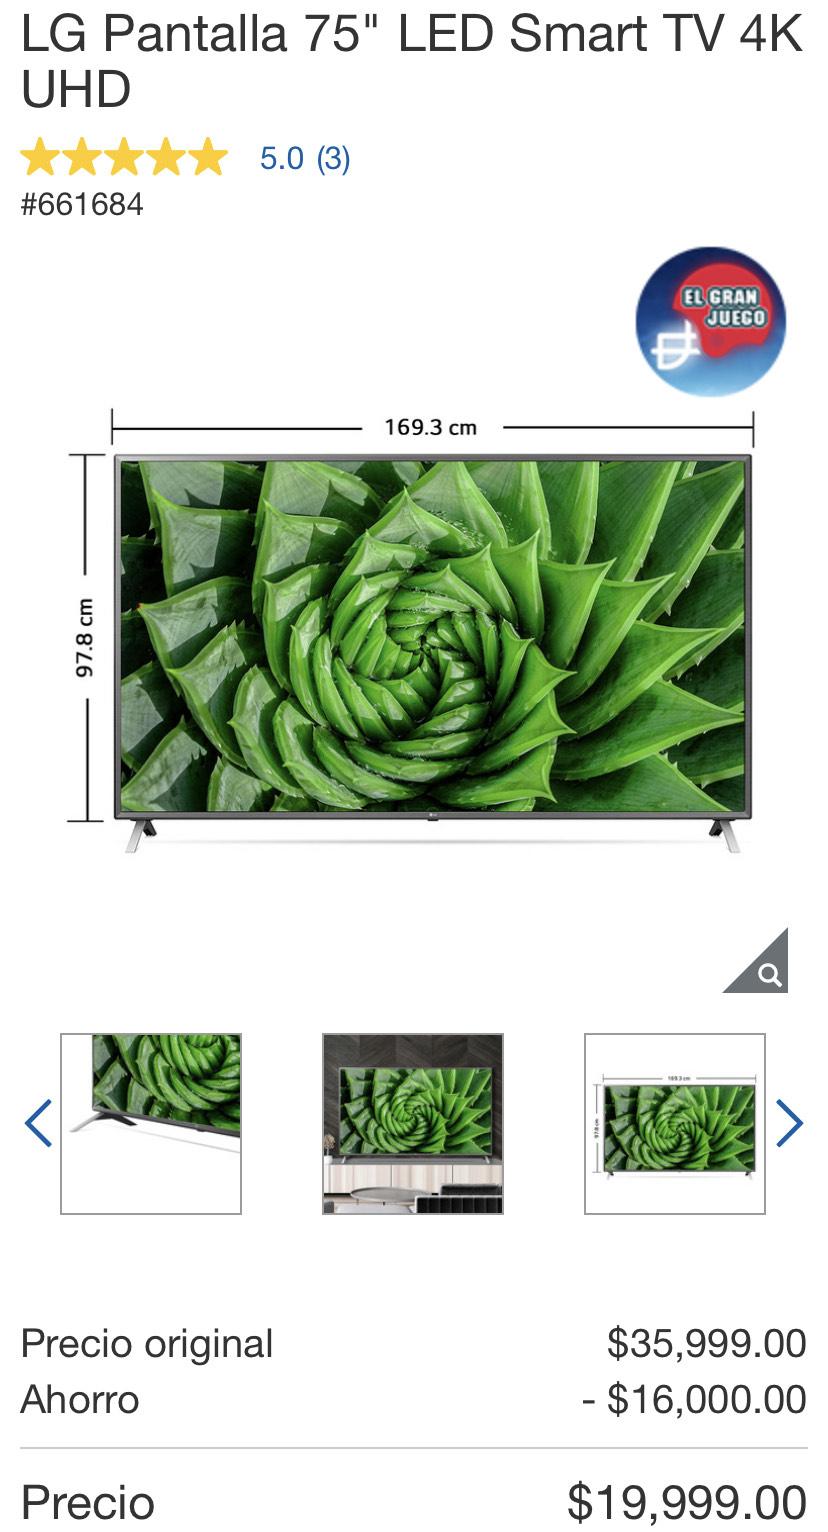 "Costco: LG Pantalla 75"" LED Smart TV 4K UHD"